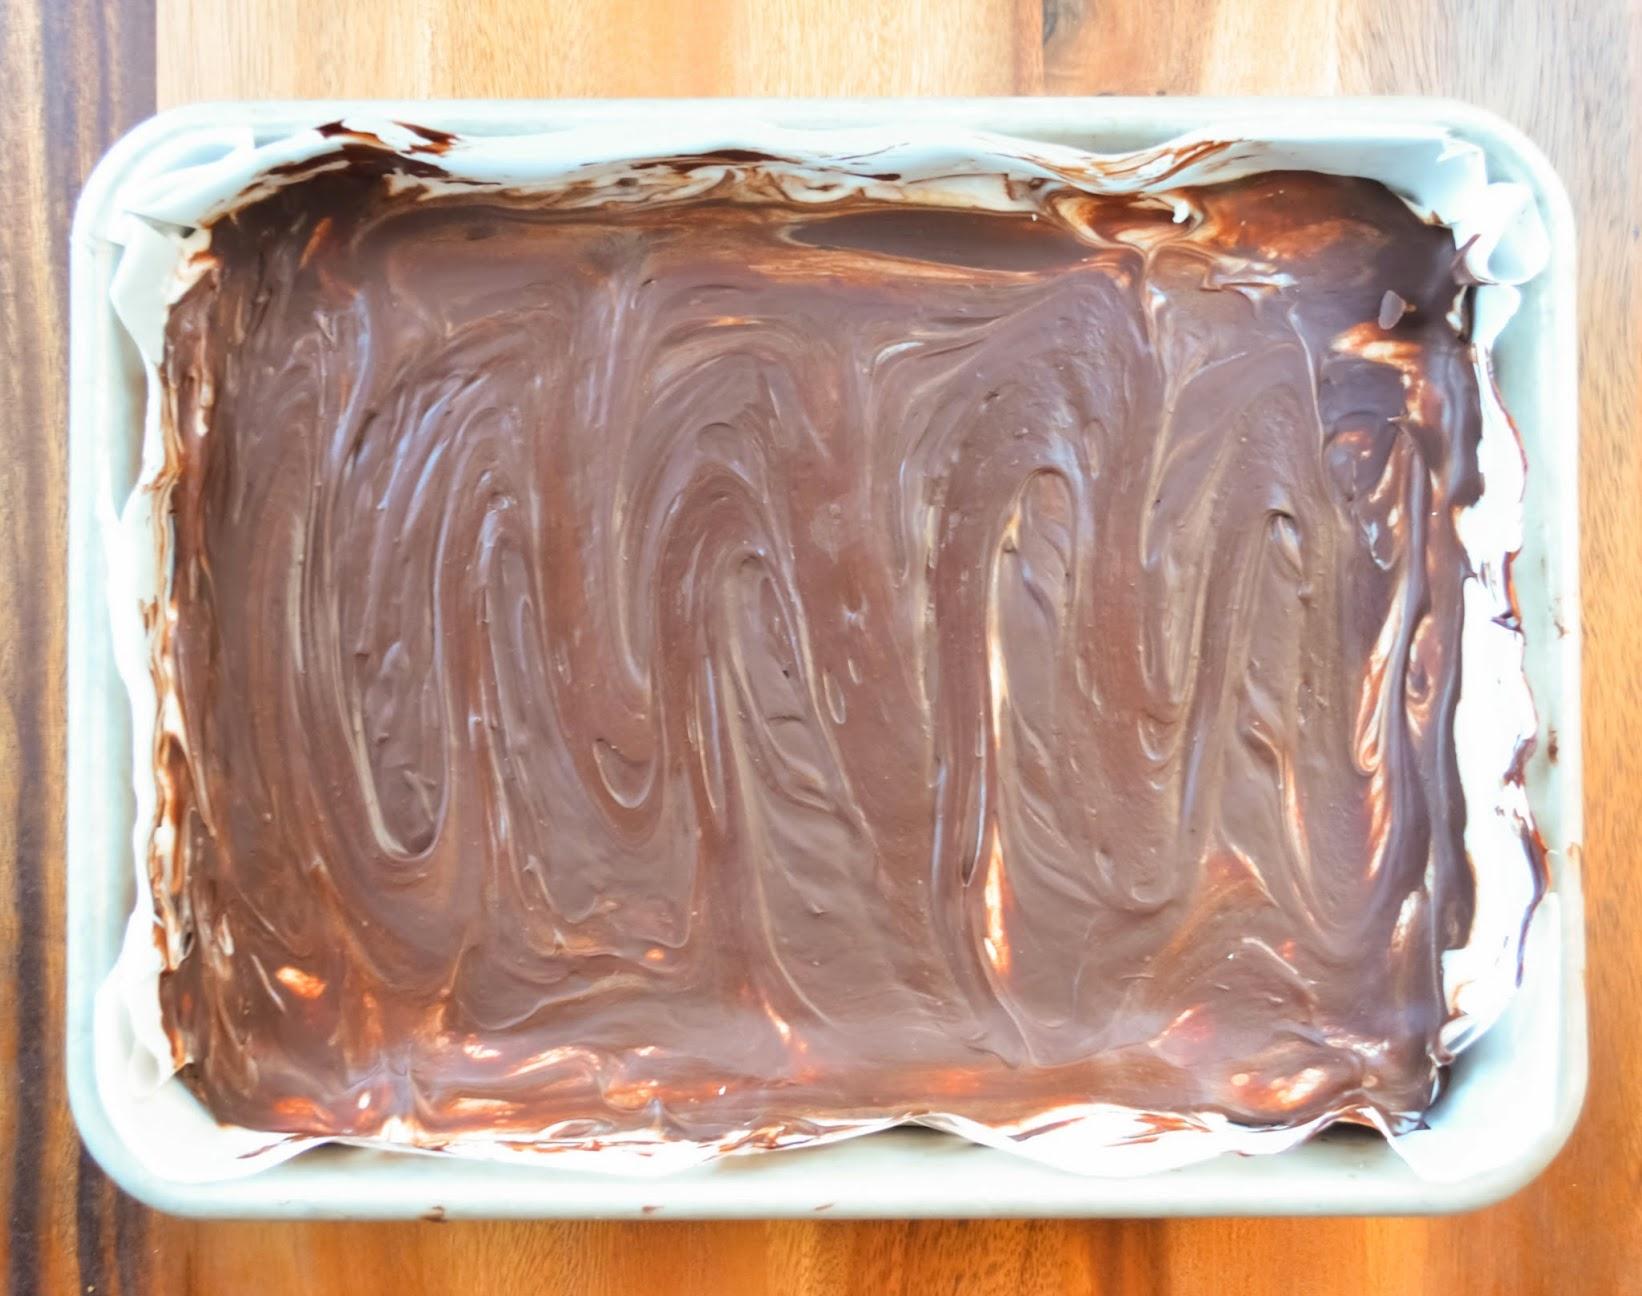 Creme-De-Menthe-Fudge-Brownies-Spread-Chocolate.jpg